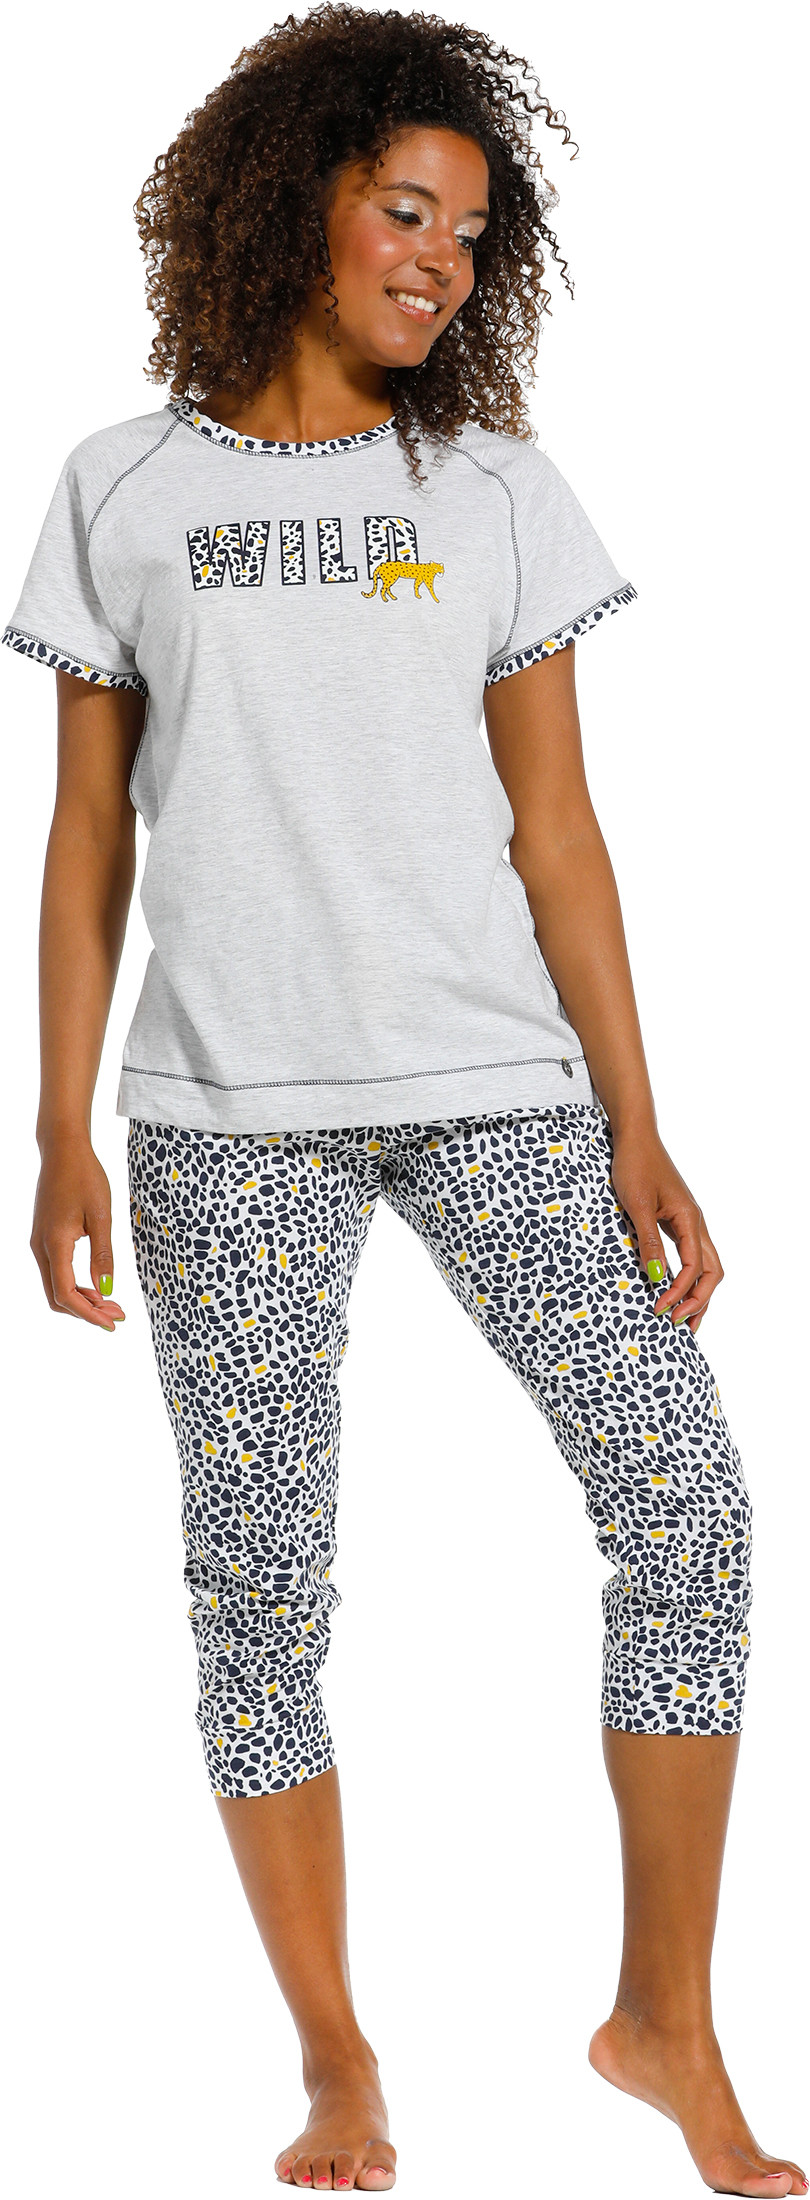 Dames pyjama Rebelle 21211-407-2-40